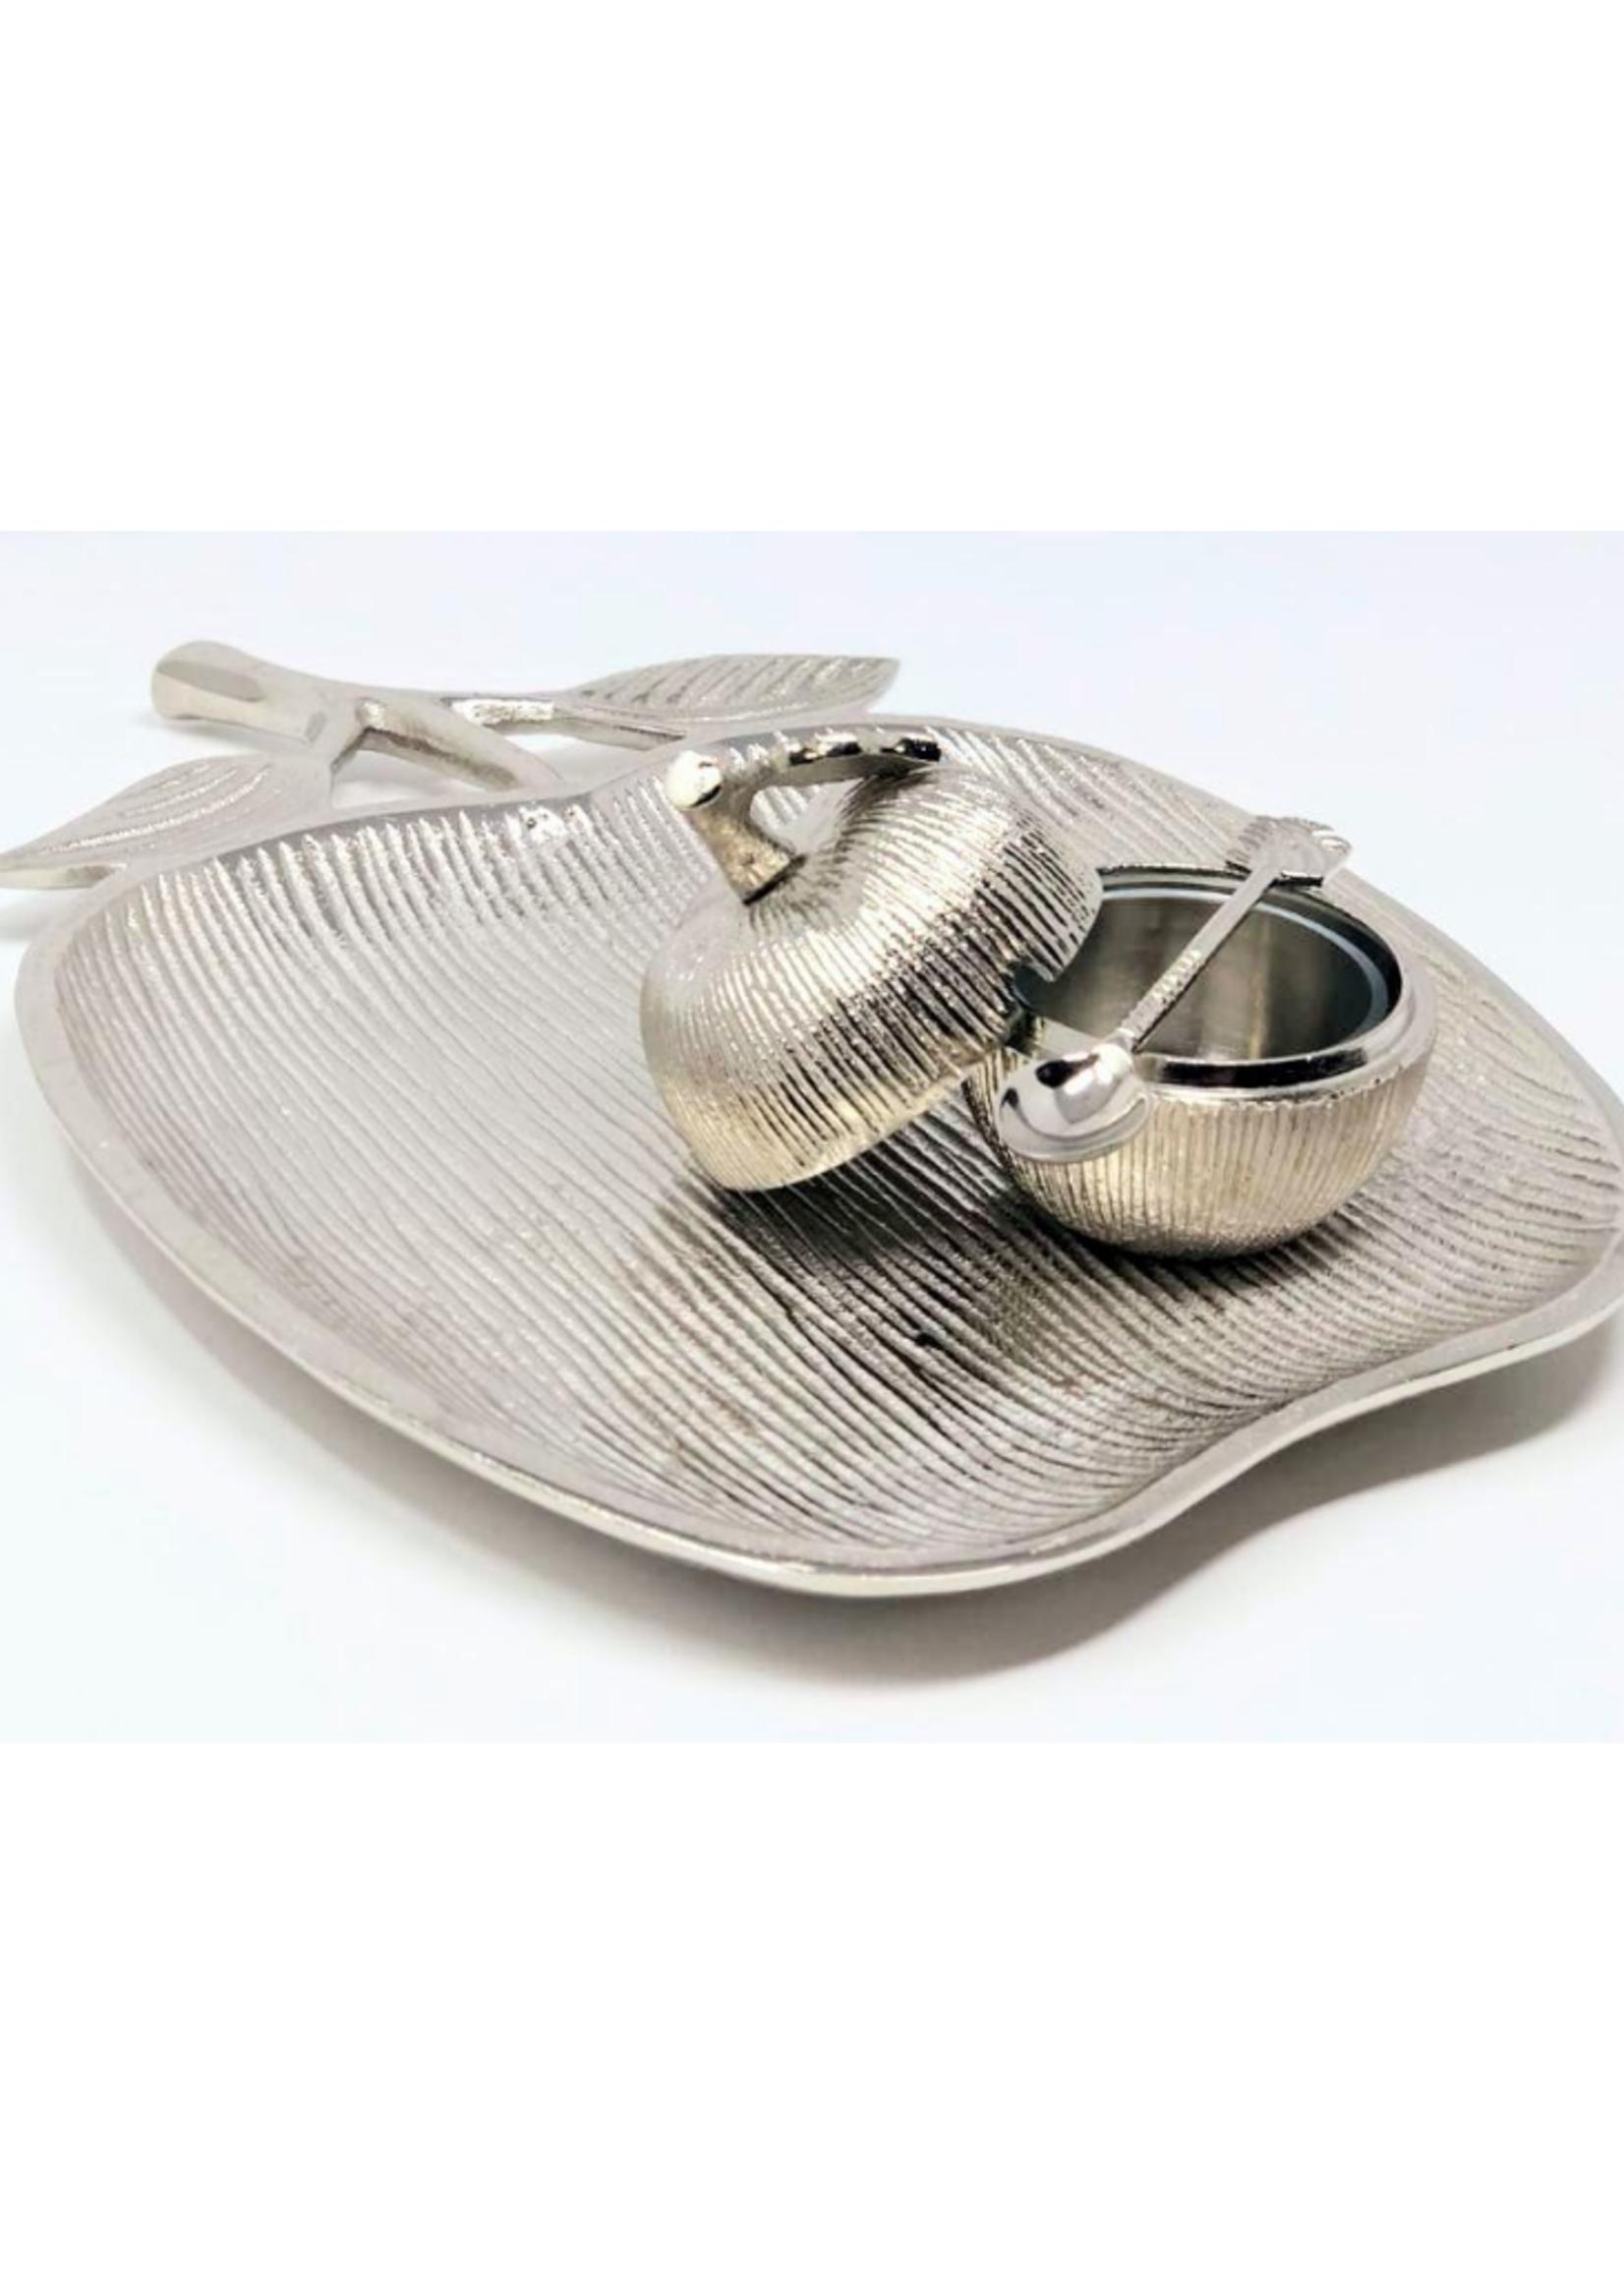 Silver Apple Dish & Honey Jar